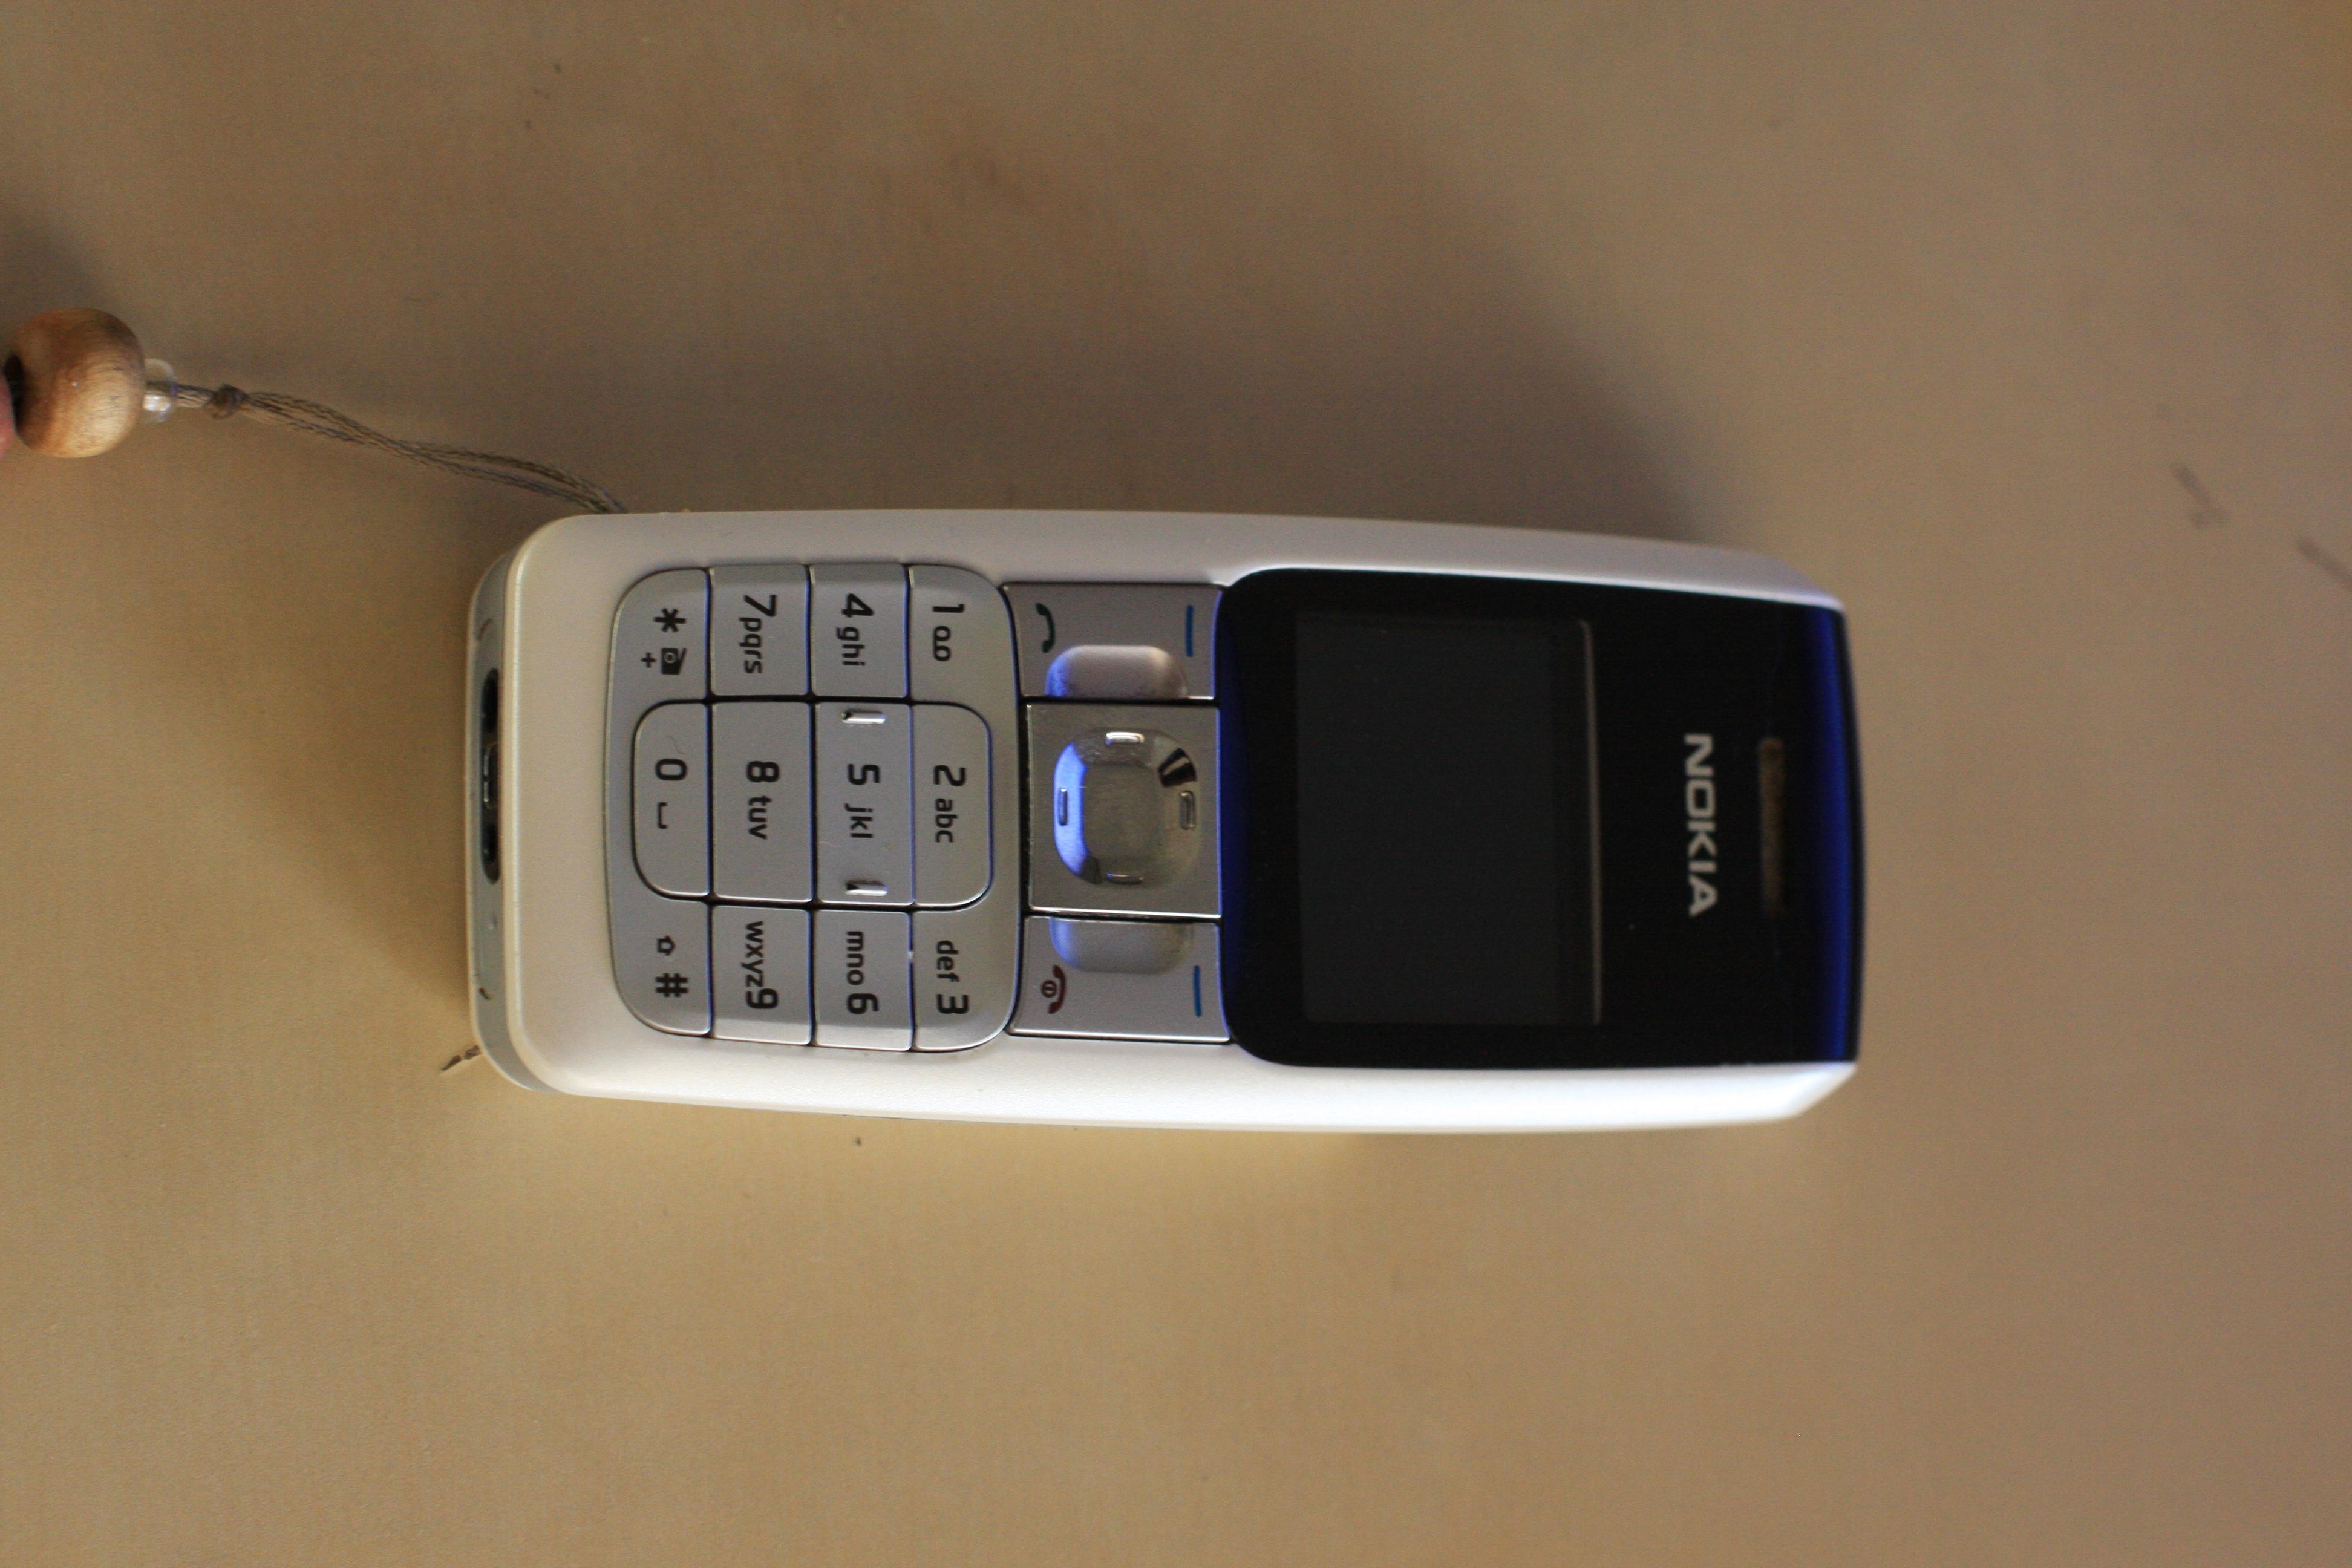 File:Nokia 2310.jpeg